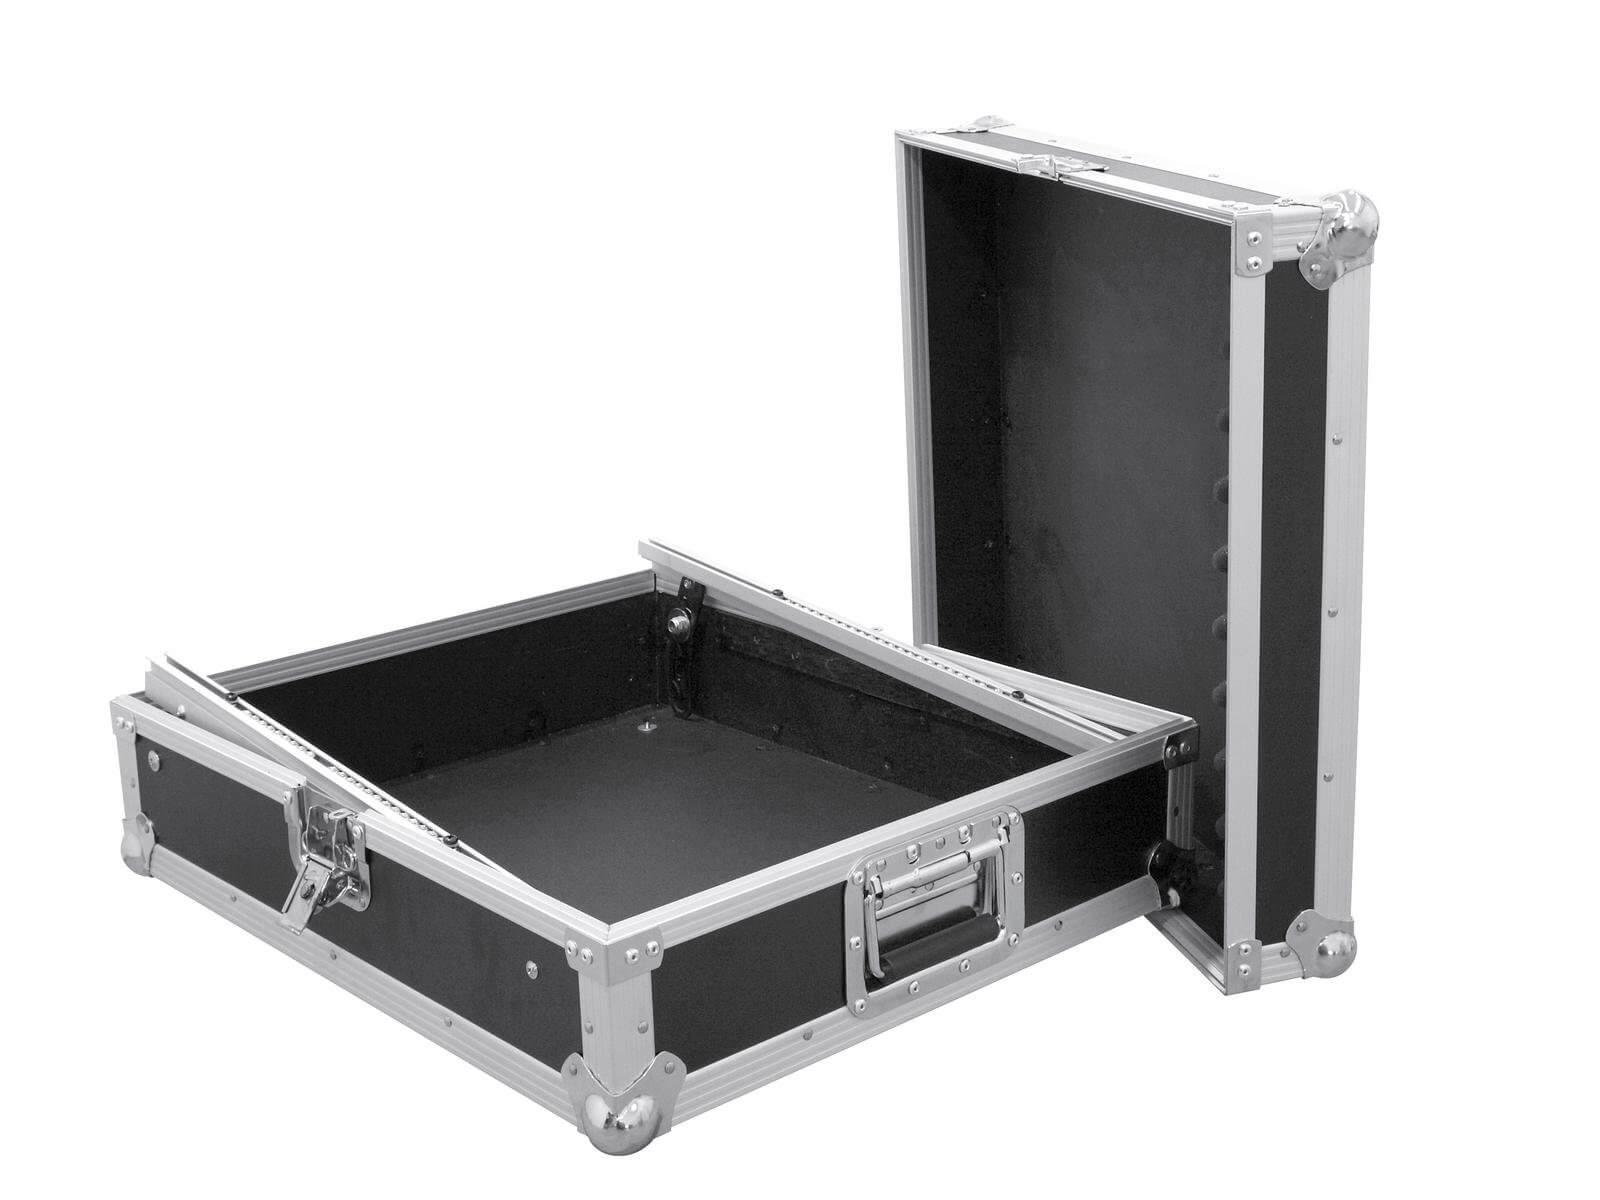 Roadinger Mixer Case Pro MCV-19 12U